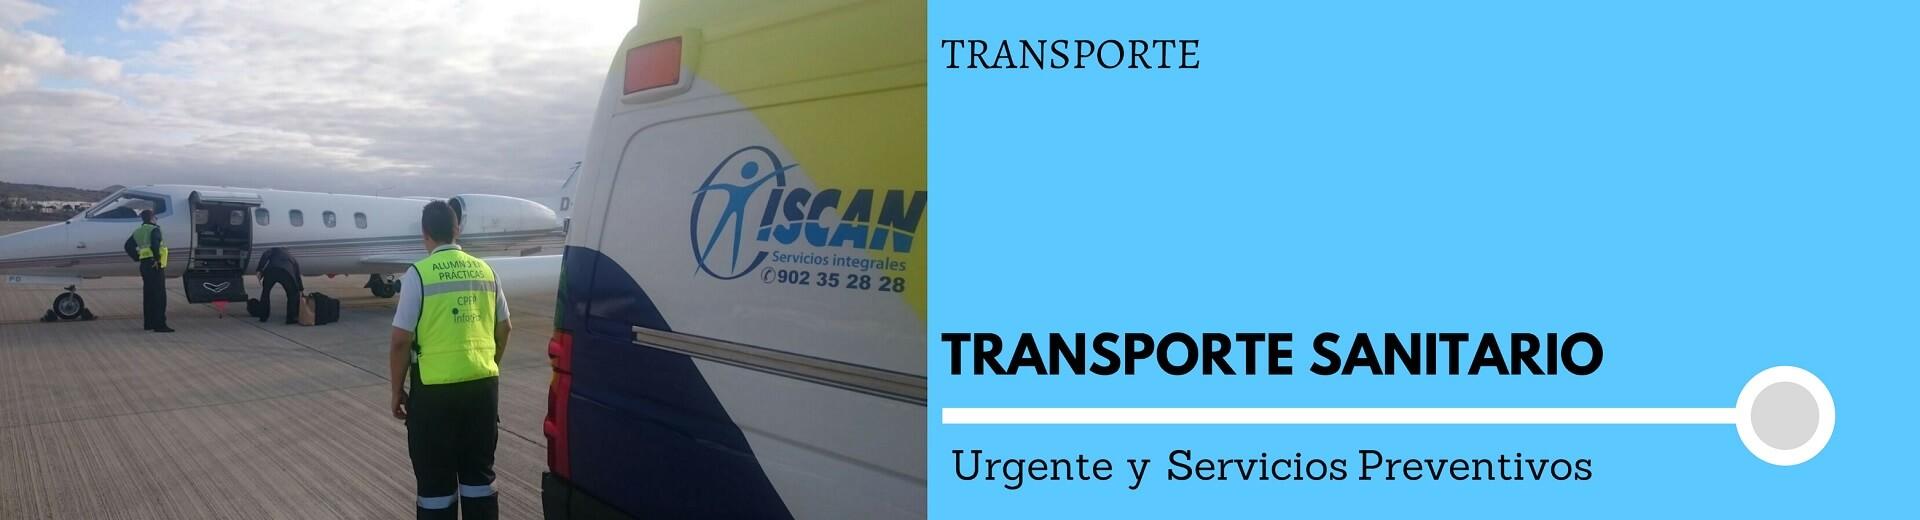 ISCAN_transporteurgente